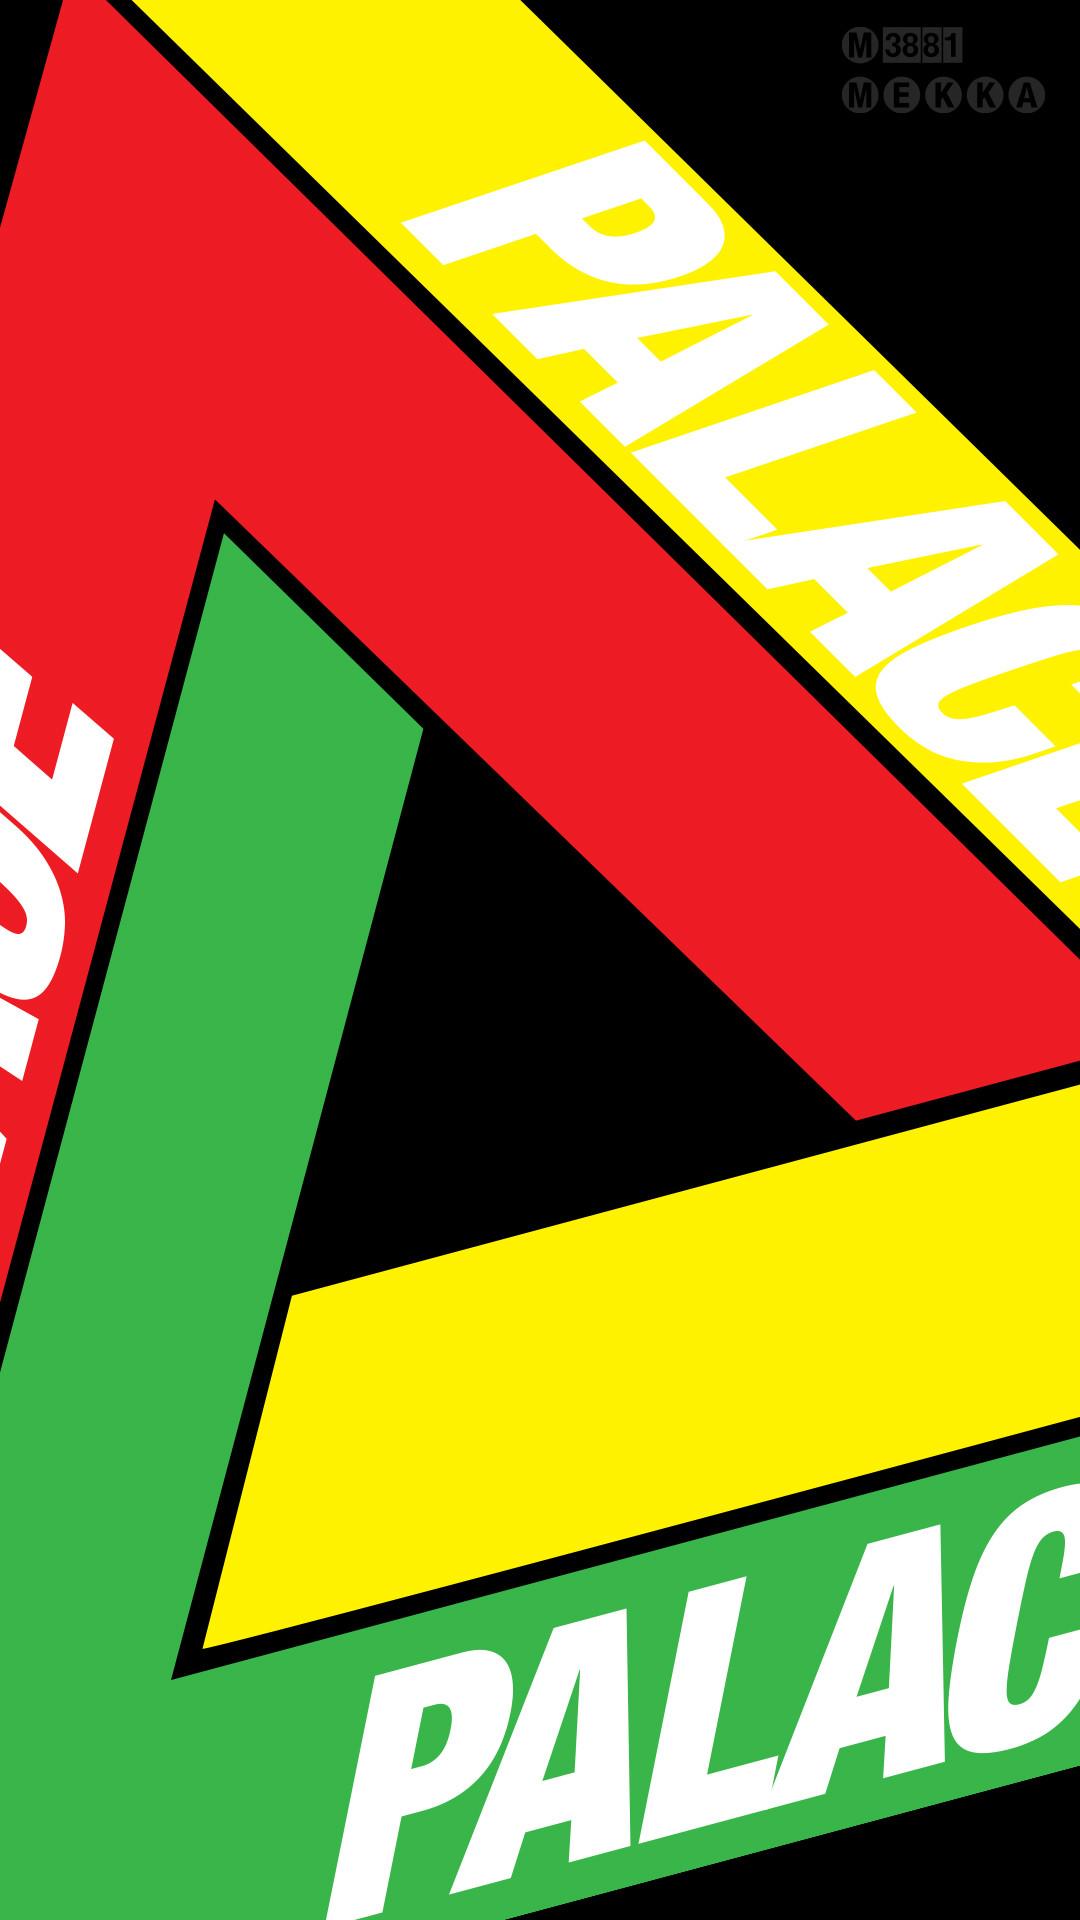 Skateboarding Logo Wallpaper – WallpaperSafari